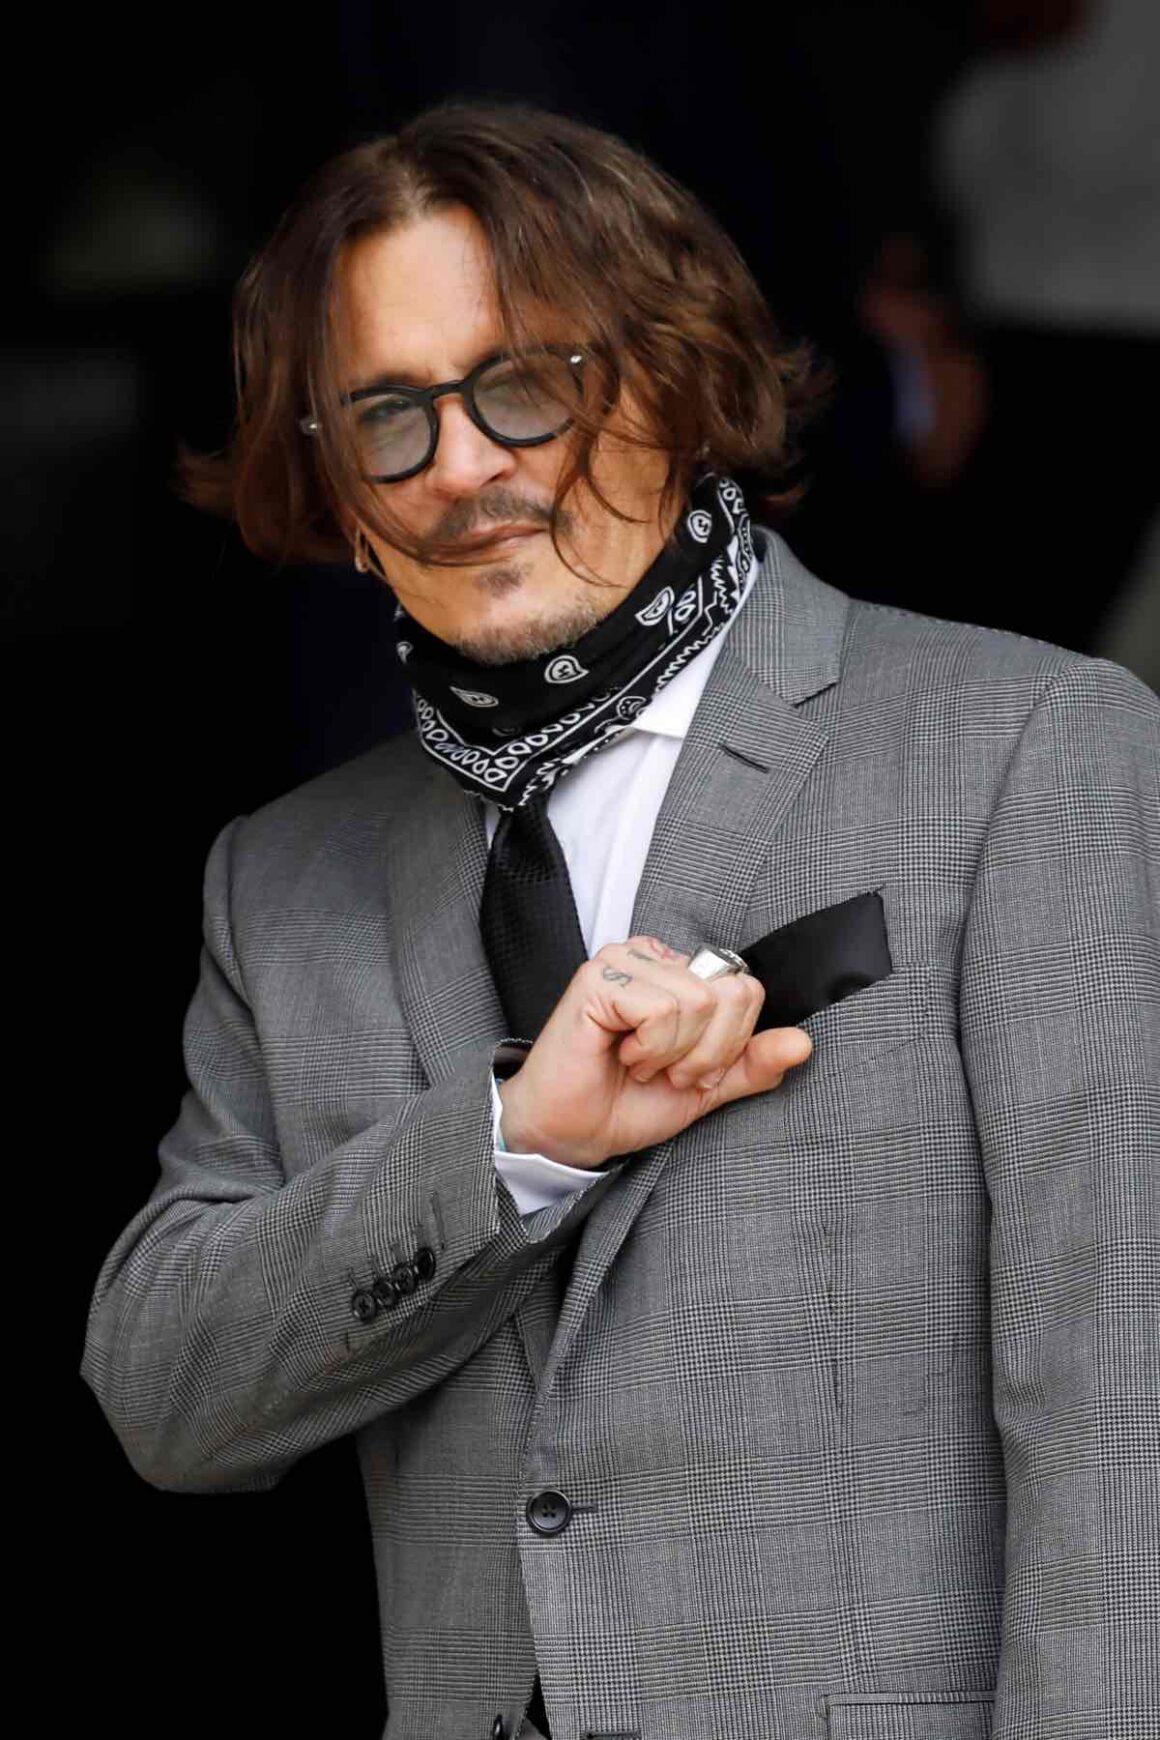 Johnny Depp Libel Trial Resumes In London